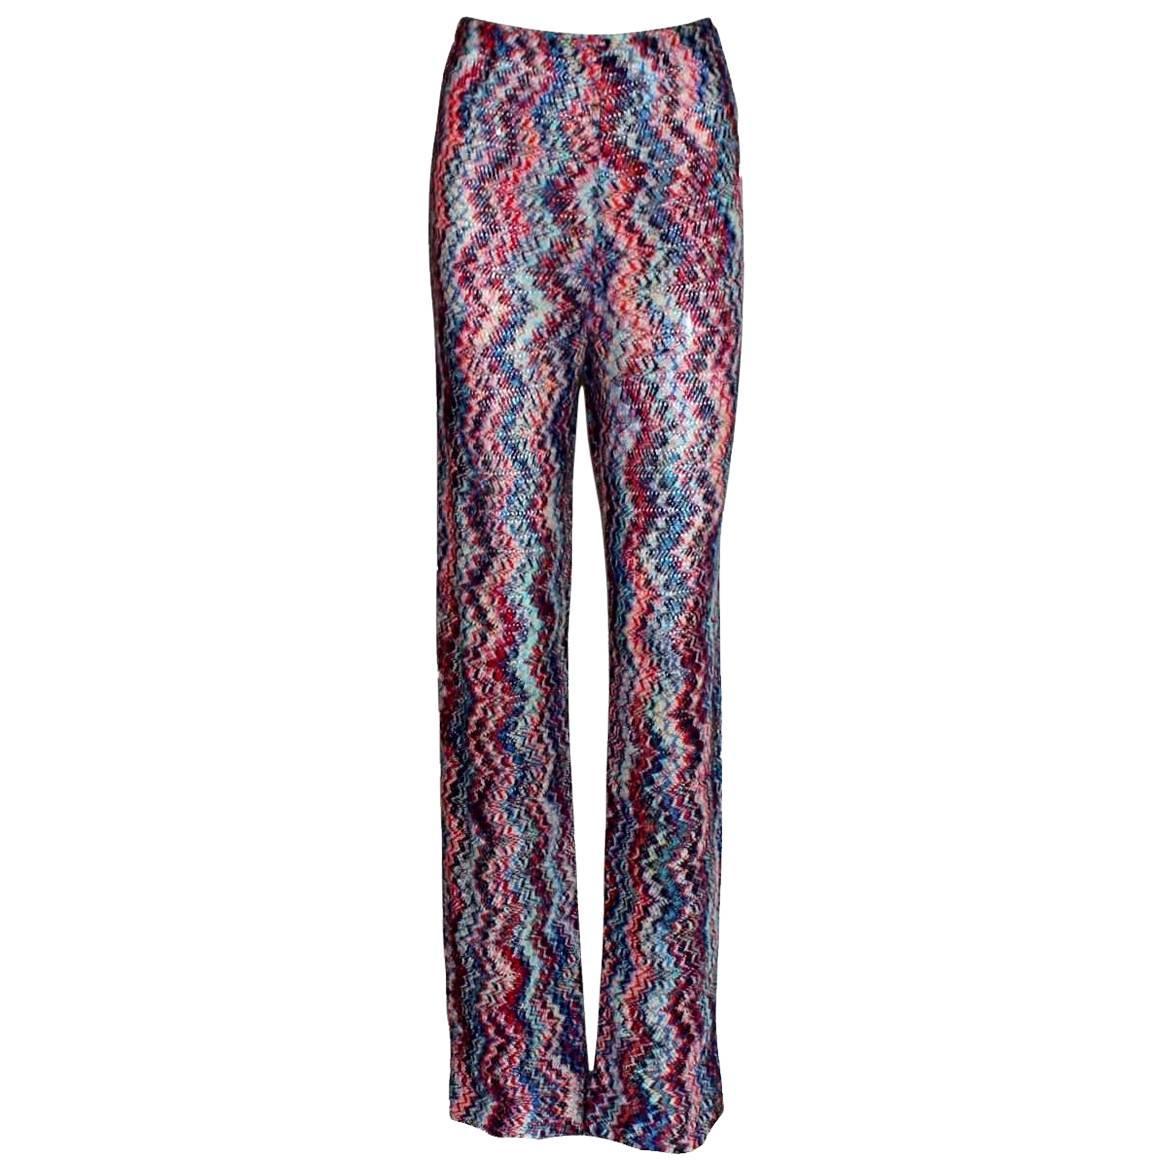 Missoni Signature Zigzag Crochet-Knit Wide Leg Palazzo Pants For Sale